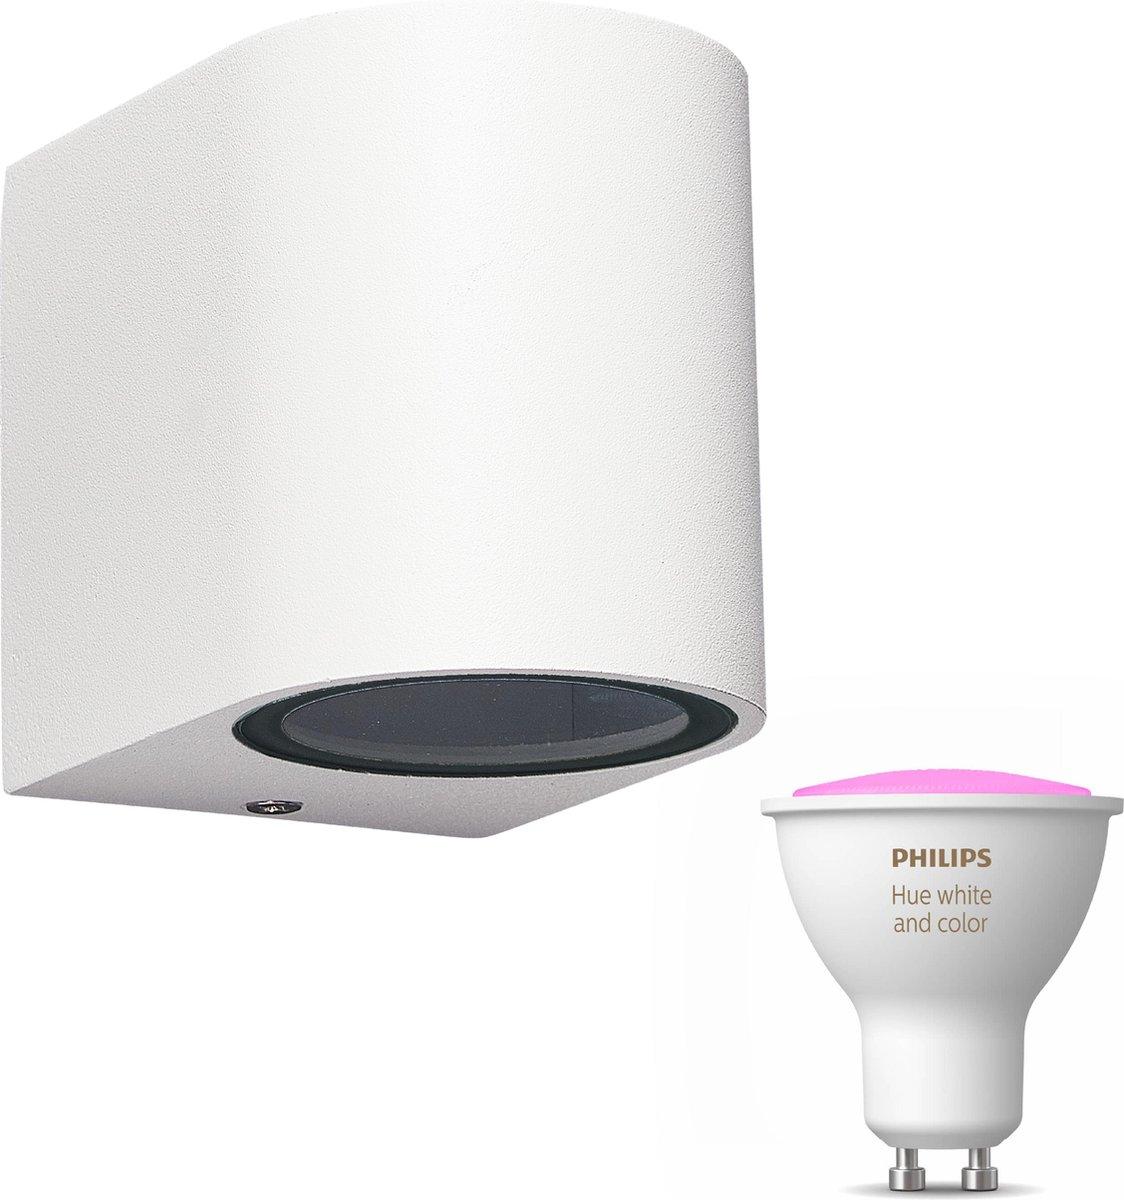 Mantra Kandachu wandlamp rond - wit - 1 lichtpunt - Incl. Philips Hue White & Color Ambiance Gu10 (geschikt voor buitengebruik)